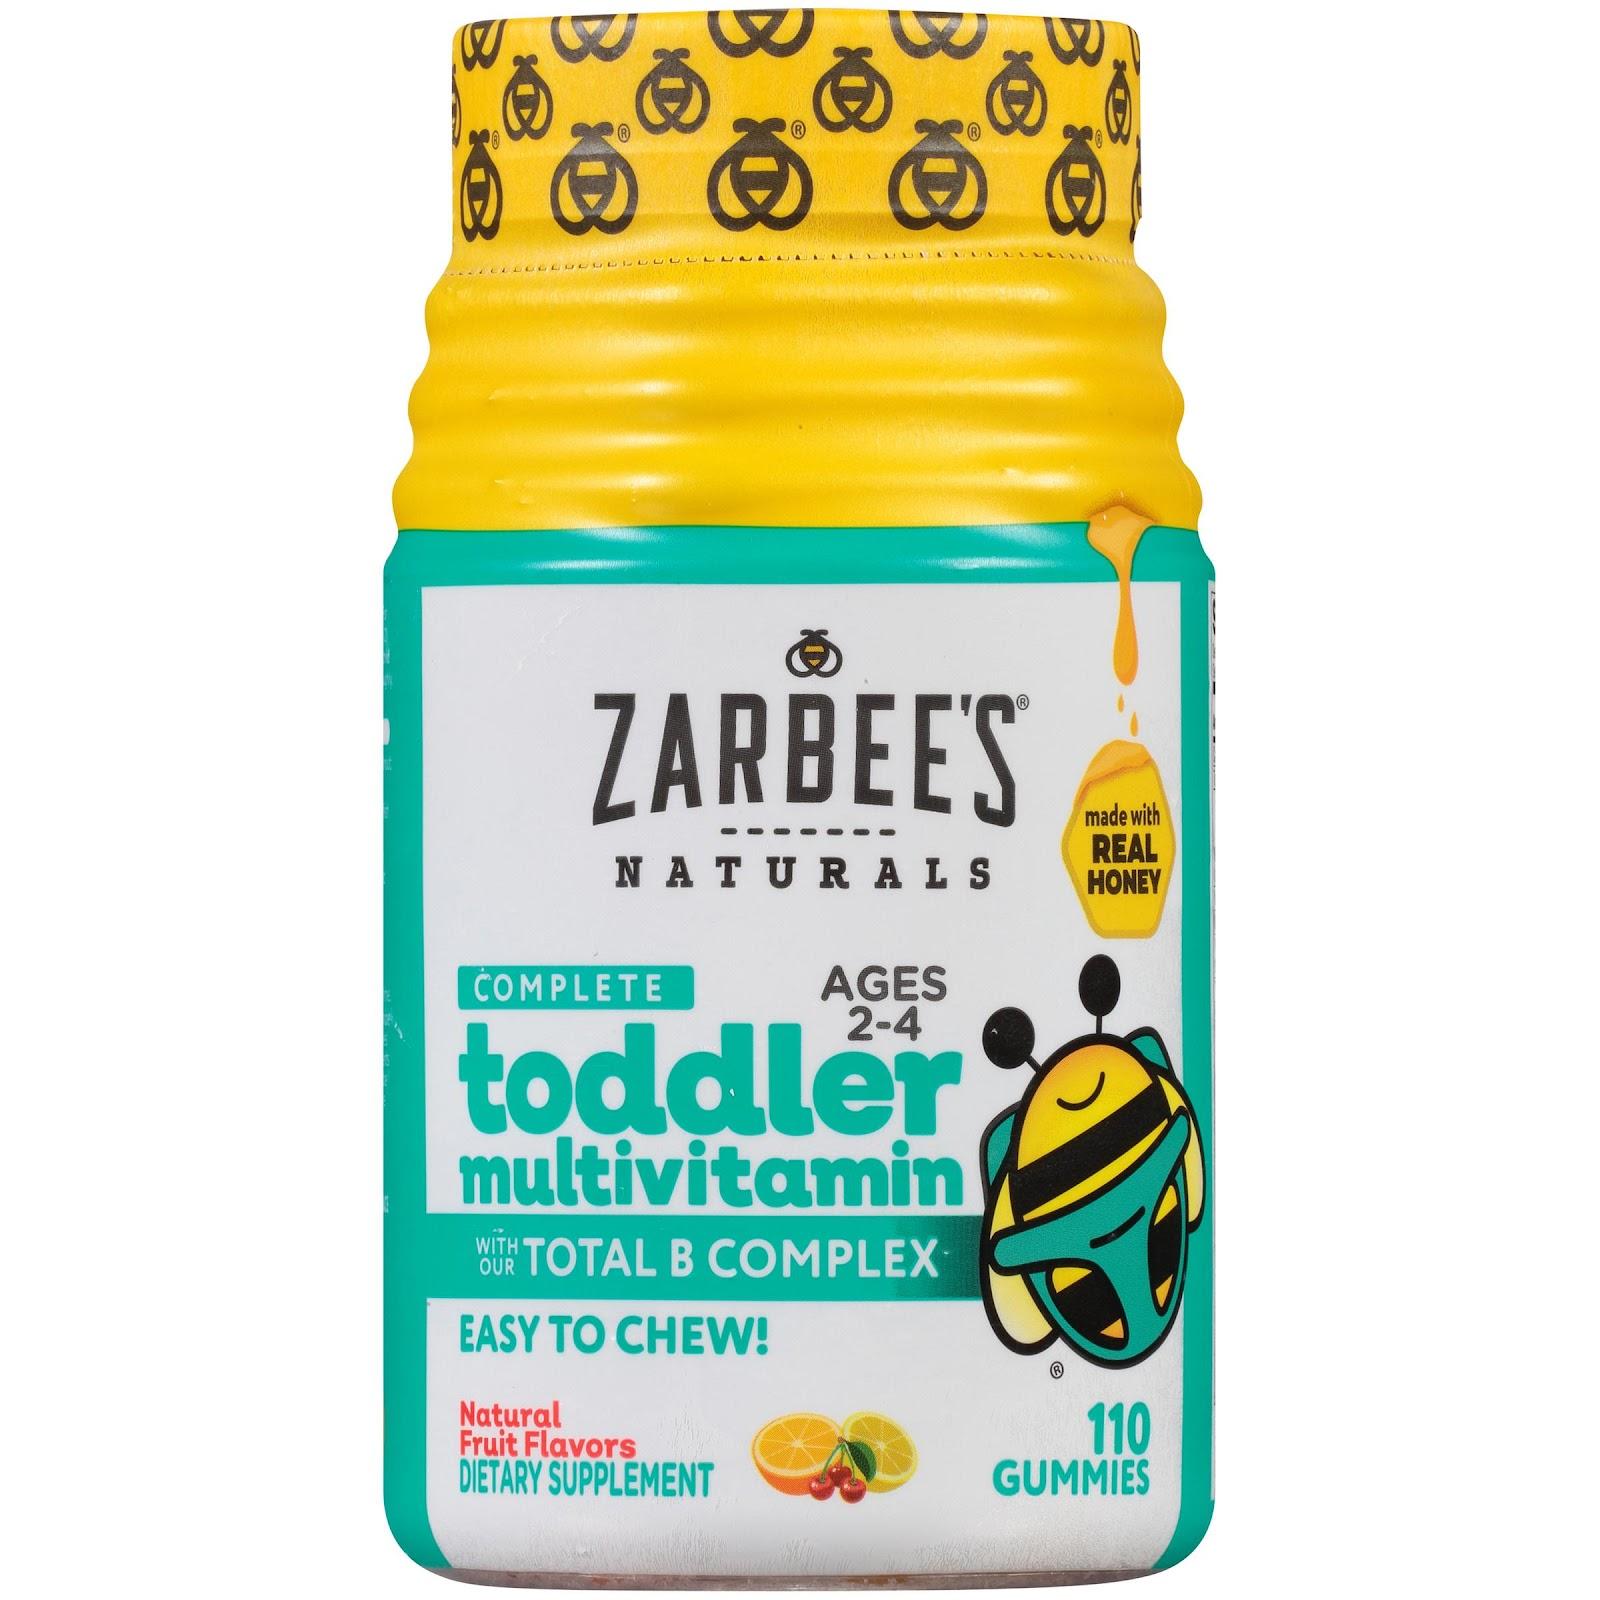 Zarbee's Naturals Complete Toddler Multivitamin